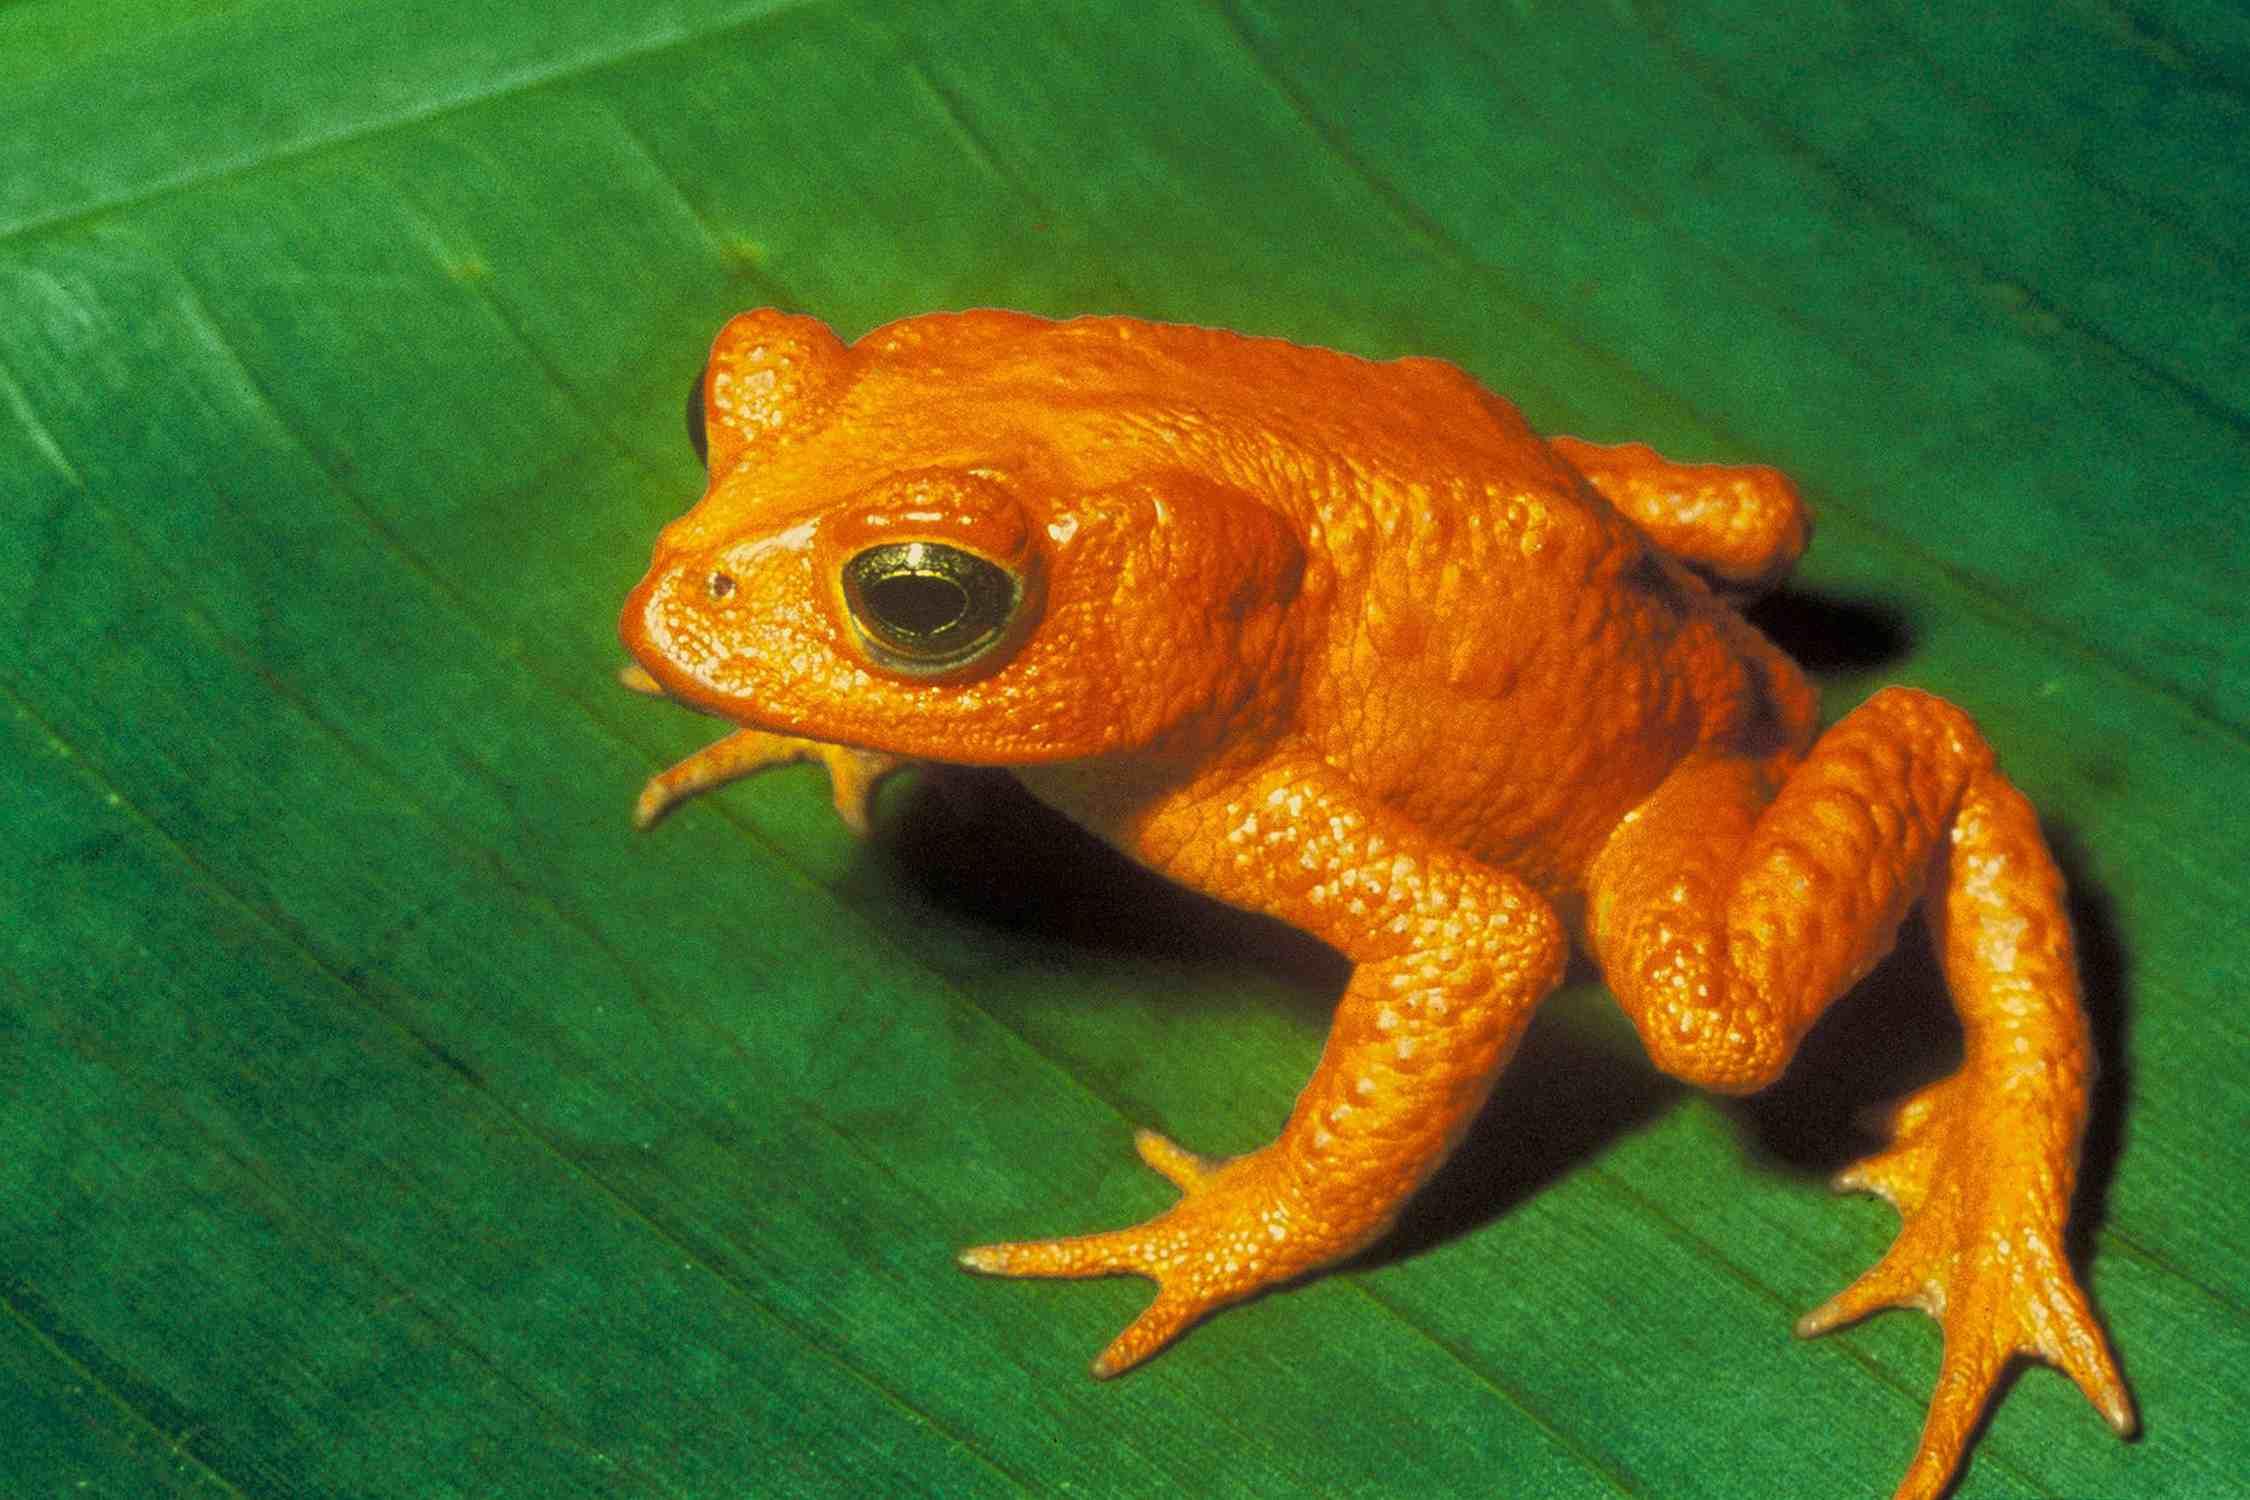 Golden toad (Bufo periglenes) on leaf.